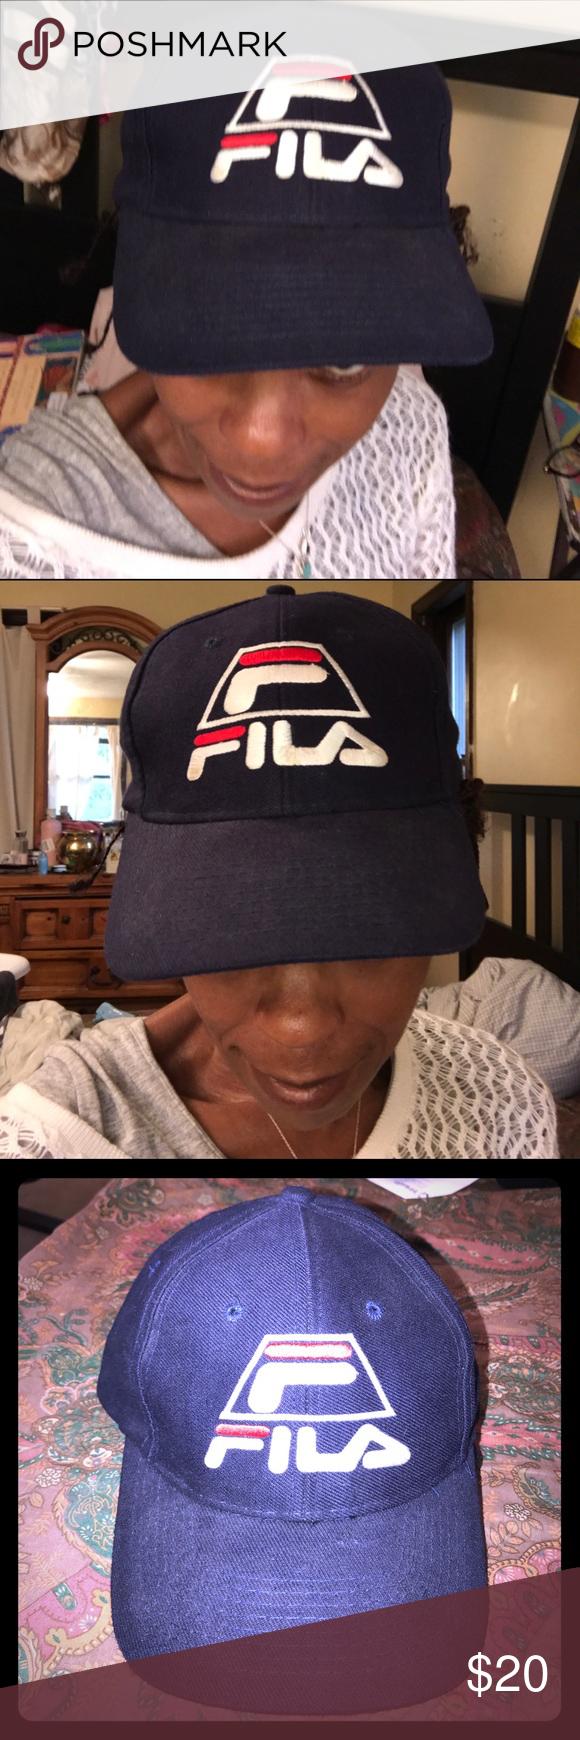 dc1ca2e7 Vintage Fila SnapBack is size Grant Hill #33 Hat Fila #33 90's Grant Hill  hat one size adjustable. Fila label inside. Stitched logo outside.